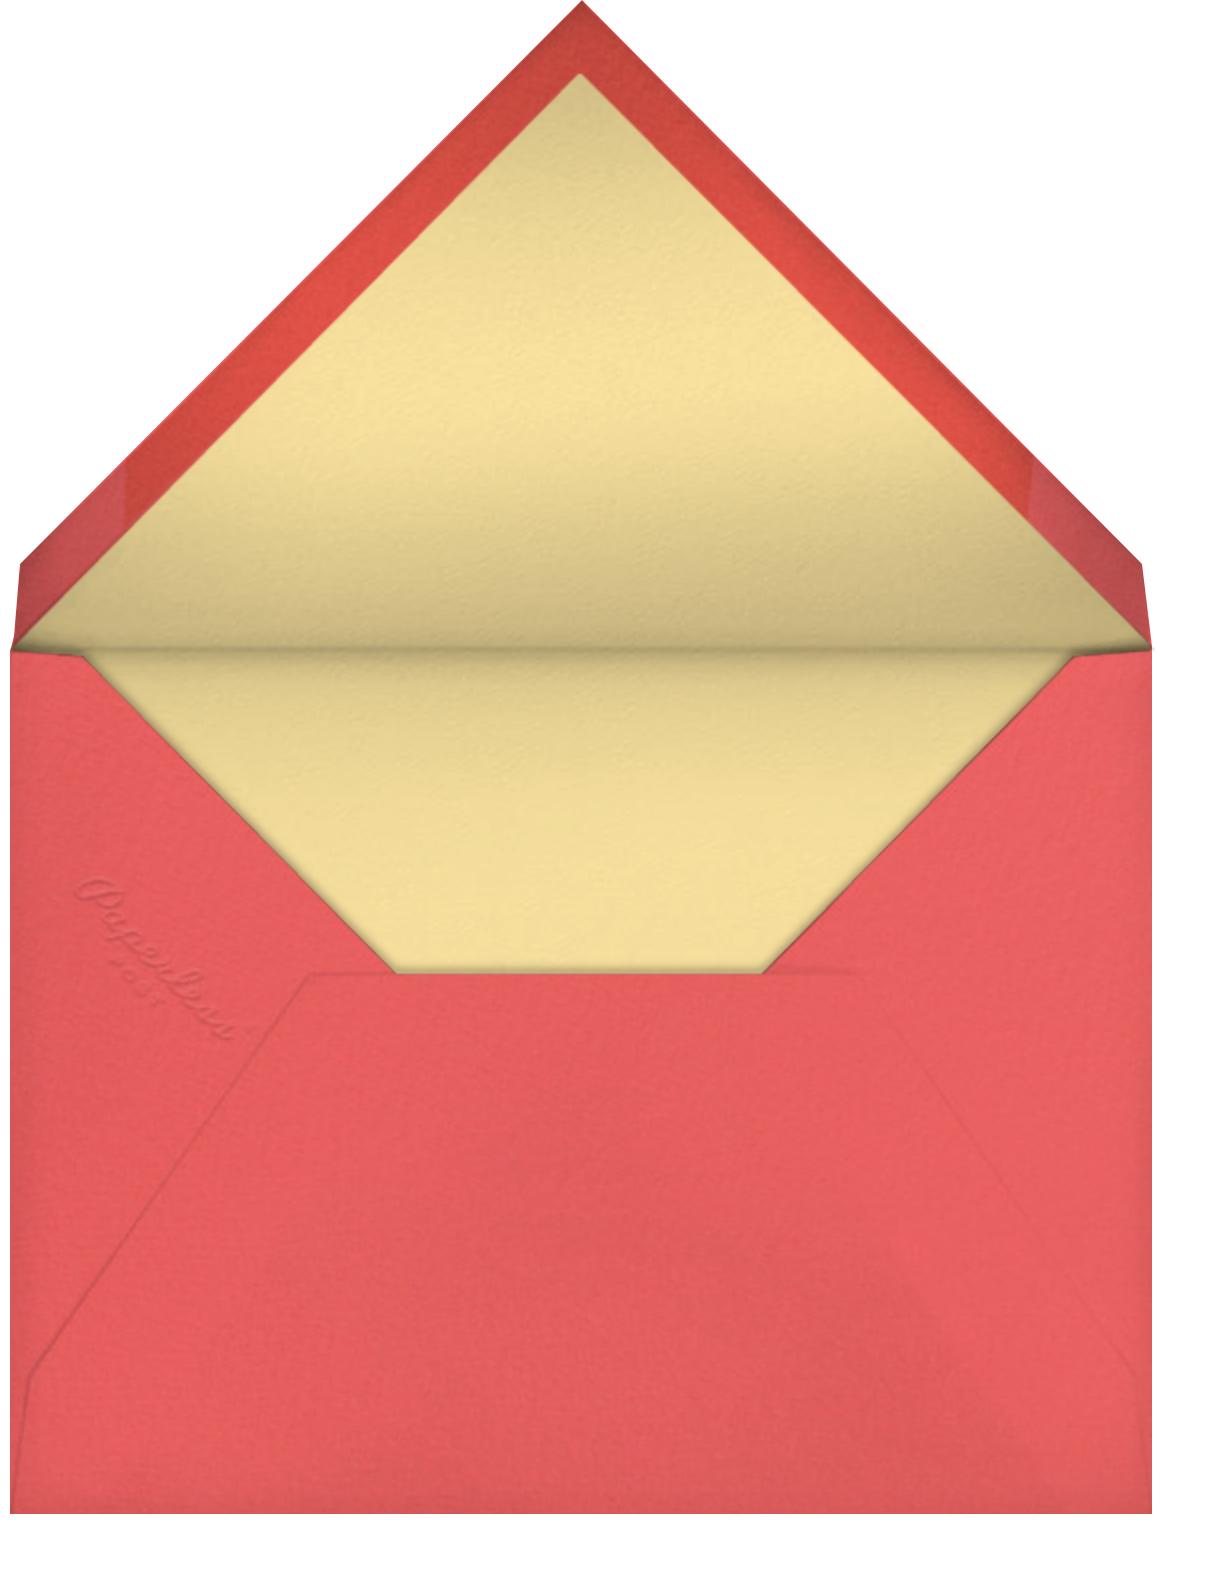 Birthday Bike (Blanca Gómez) - Deep - Red Cap Cards - Envelope